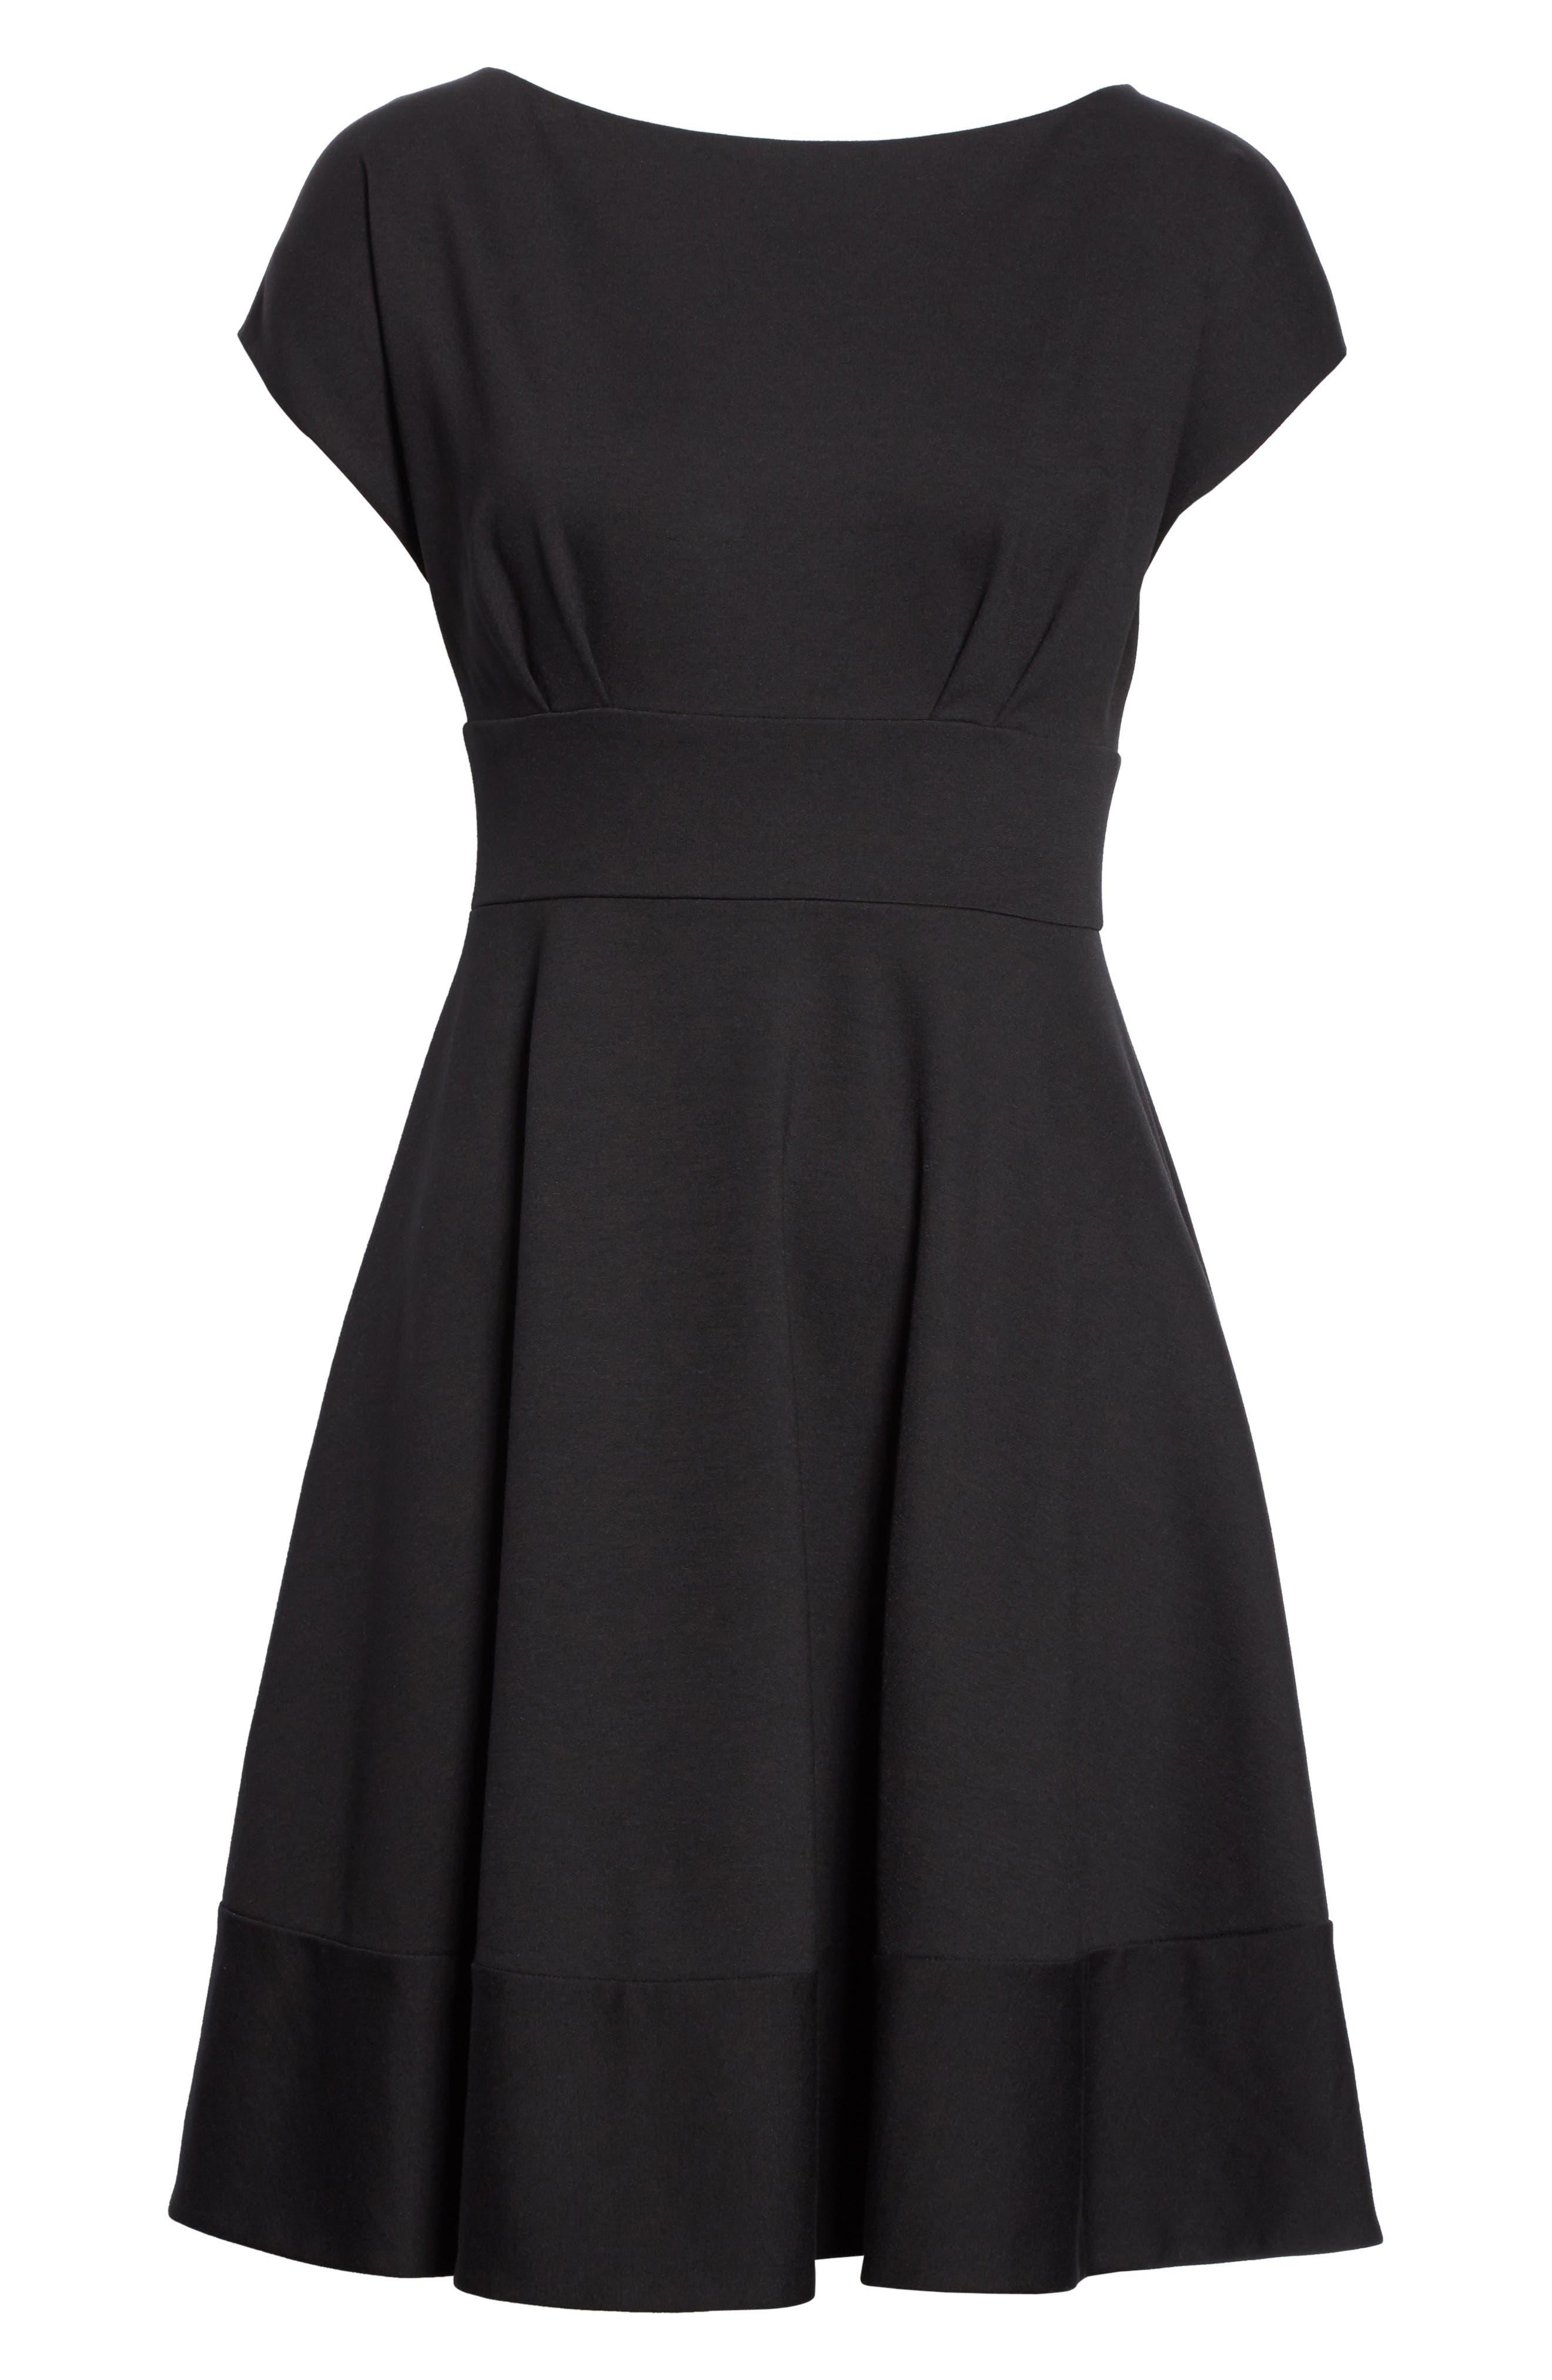 KATE SPADE NEW YORK,                             ponte fiorella fit & flare dress,                             Alternate thumbnail 7, color,                             BLACK